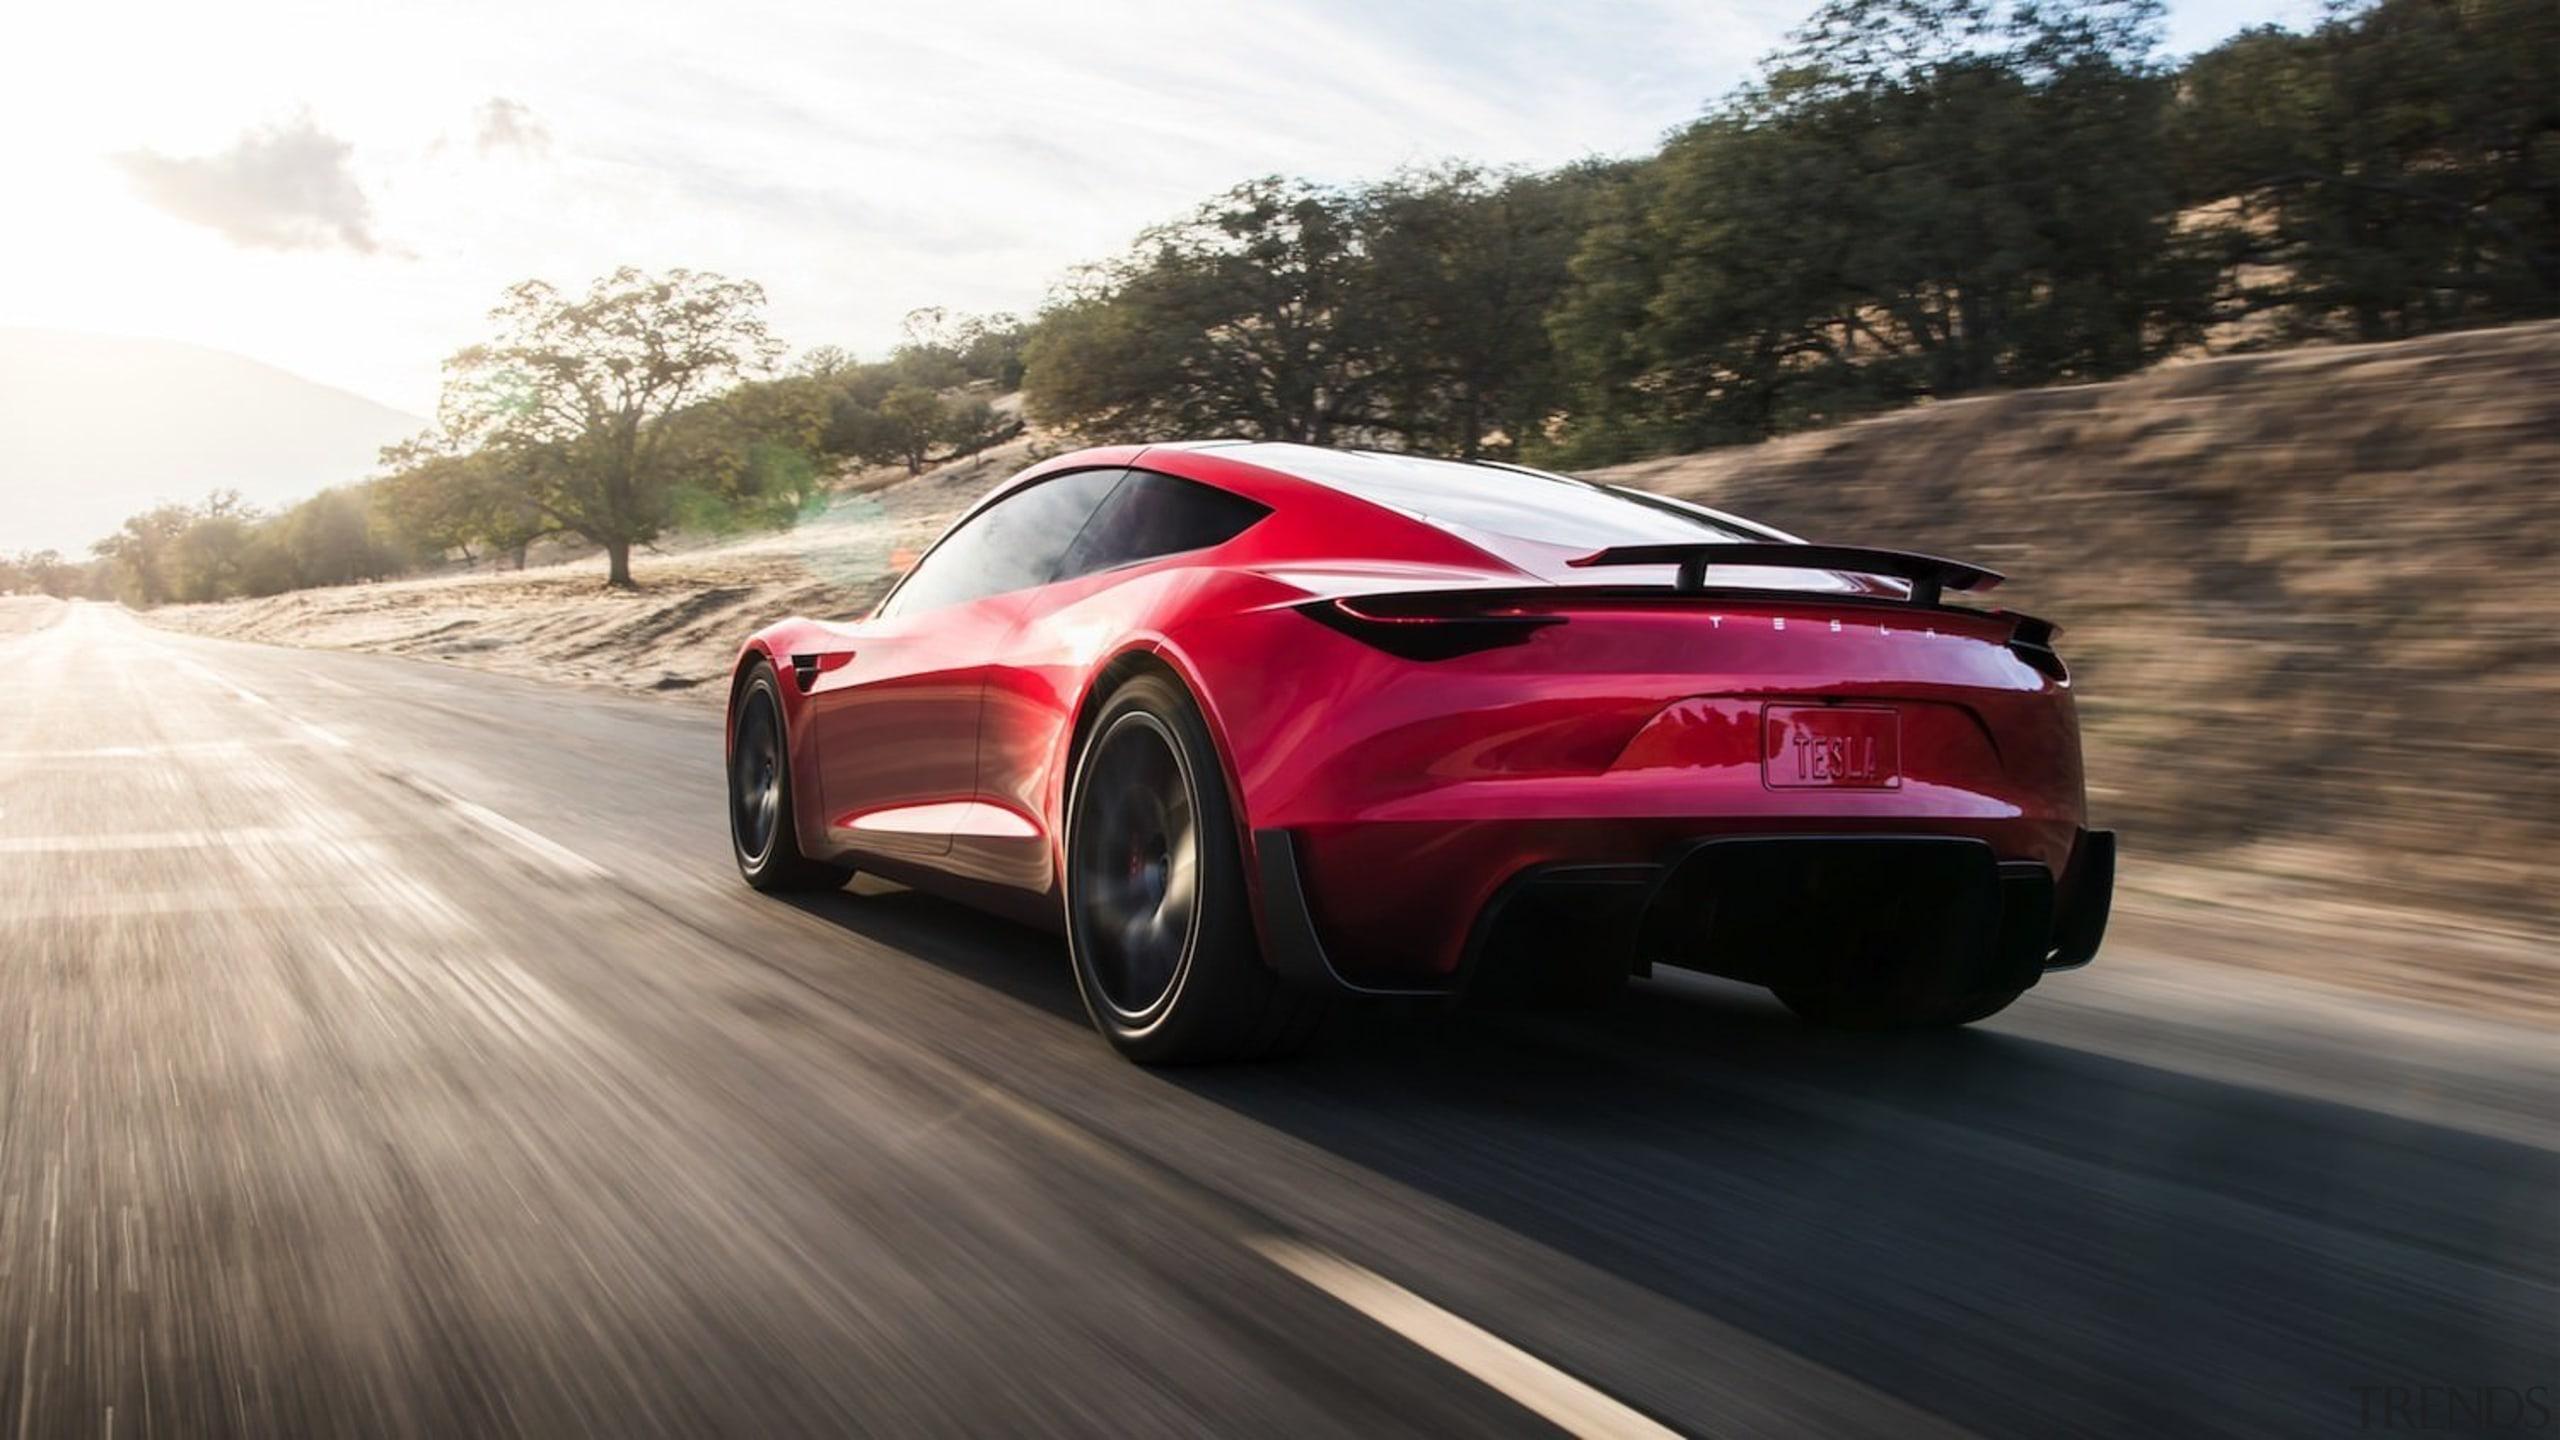 Tesla's new Roadster - Tesla's new Roadster - automotive design, automotive exterior, car, concept car, family car, luxury vehicle, mid size car, motor vehicle, performance car, personal luxury car, race car, sports car, supercar, vehicle, black, white